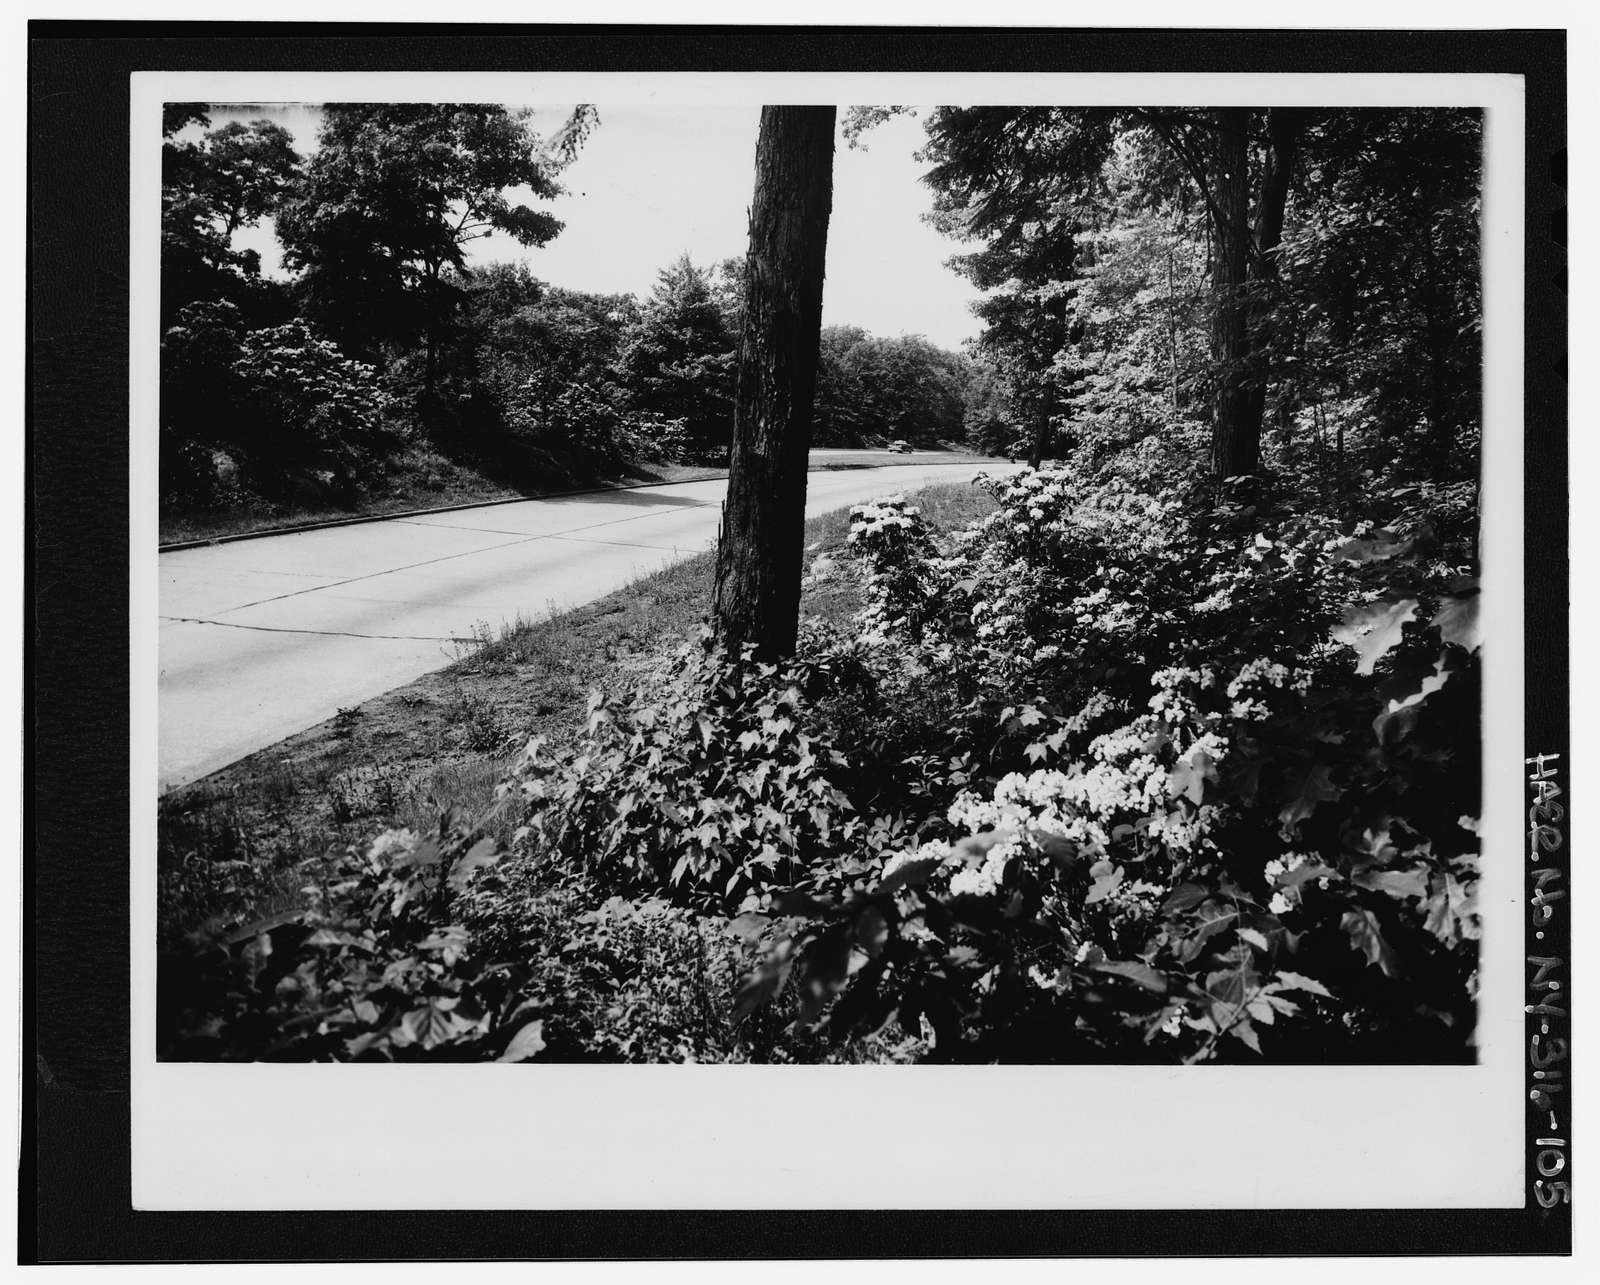 Taconic State Parkway, Poughkeepsie, Dutchess County, NY